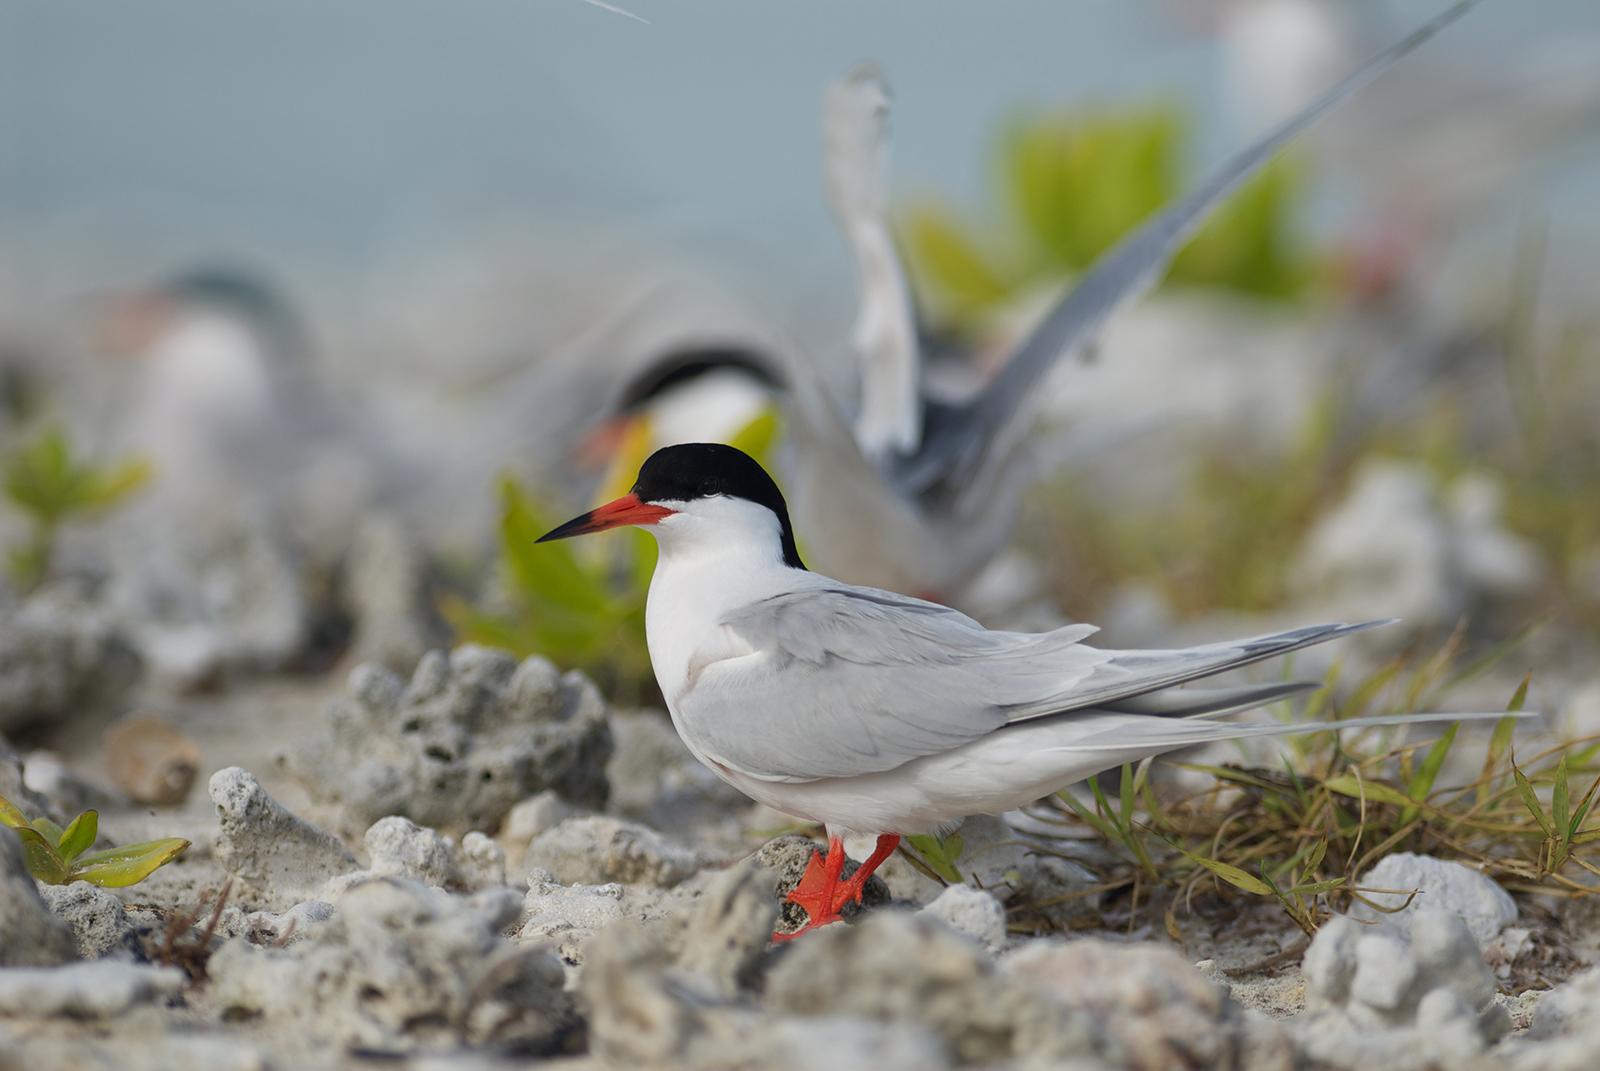 Where do birds go in winter?